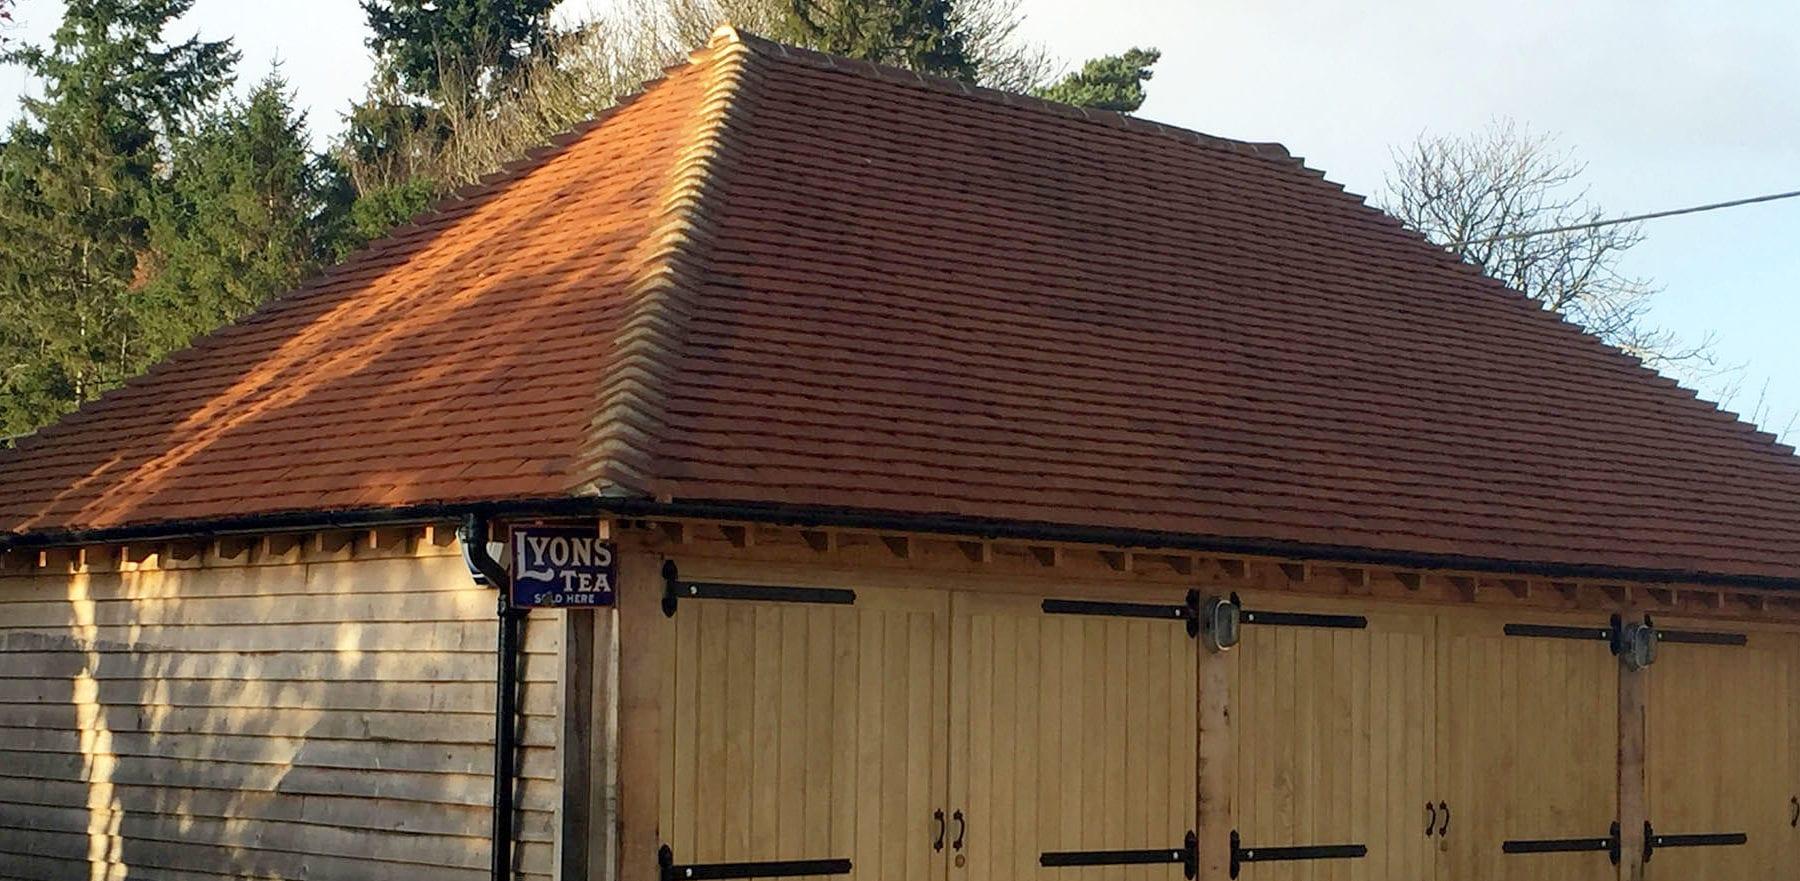 Lifestiles - Handmade Orange Clay Roof Tiles - Bramley, England 2